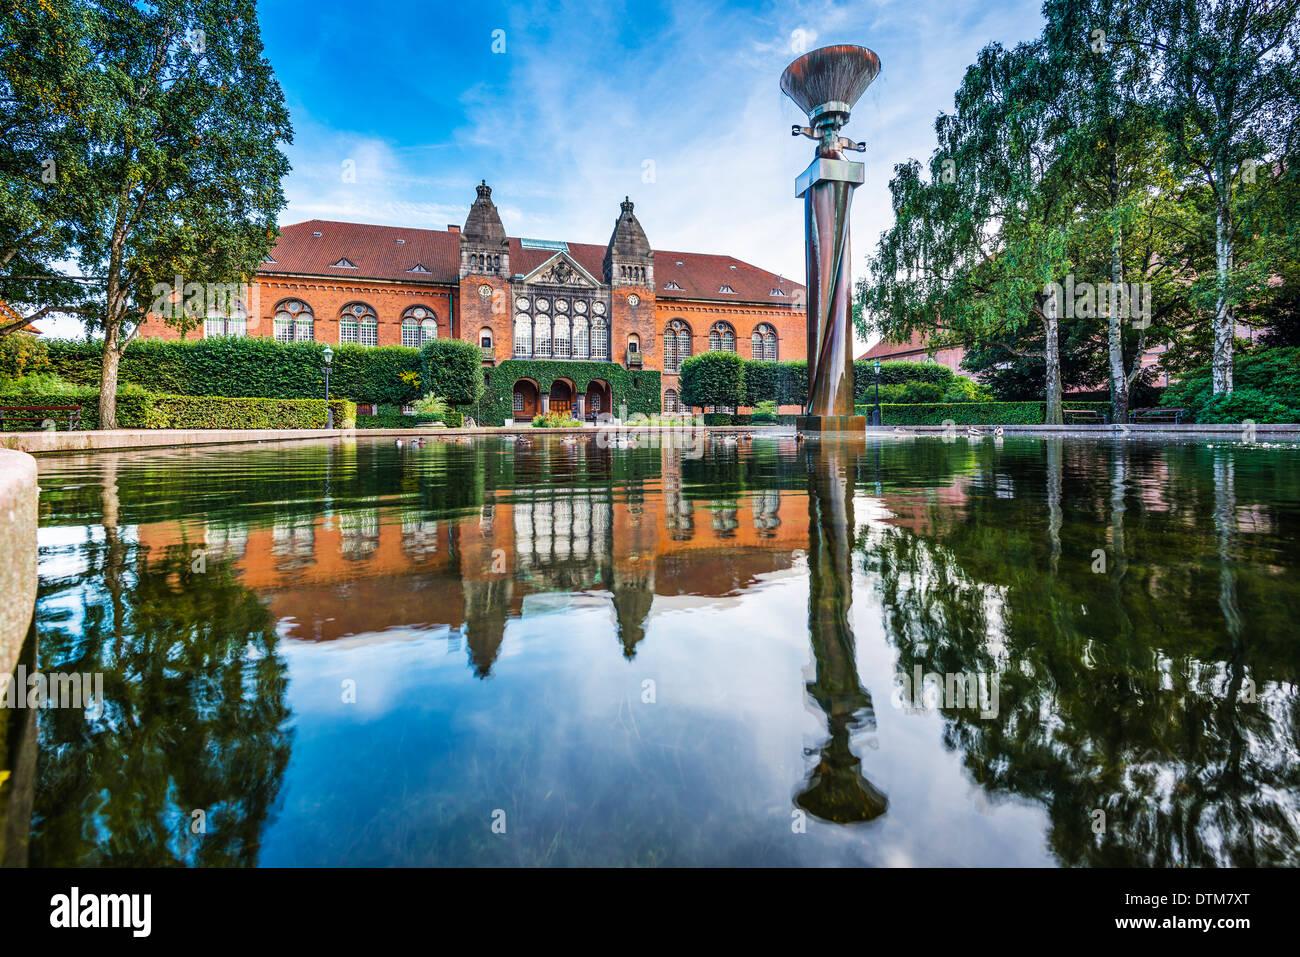 Musée Juif danois à Copenhague, Danemark. Photo Stock